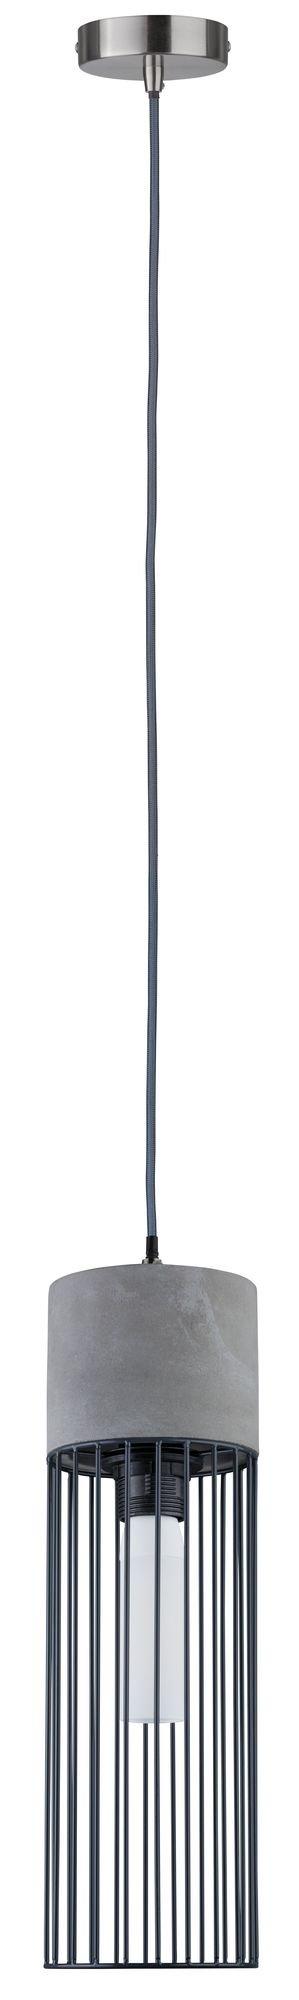 Neordic Pendelleuchte Henja E27 max. 20W Grau/Eisen gebürstet Beton/Metall